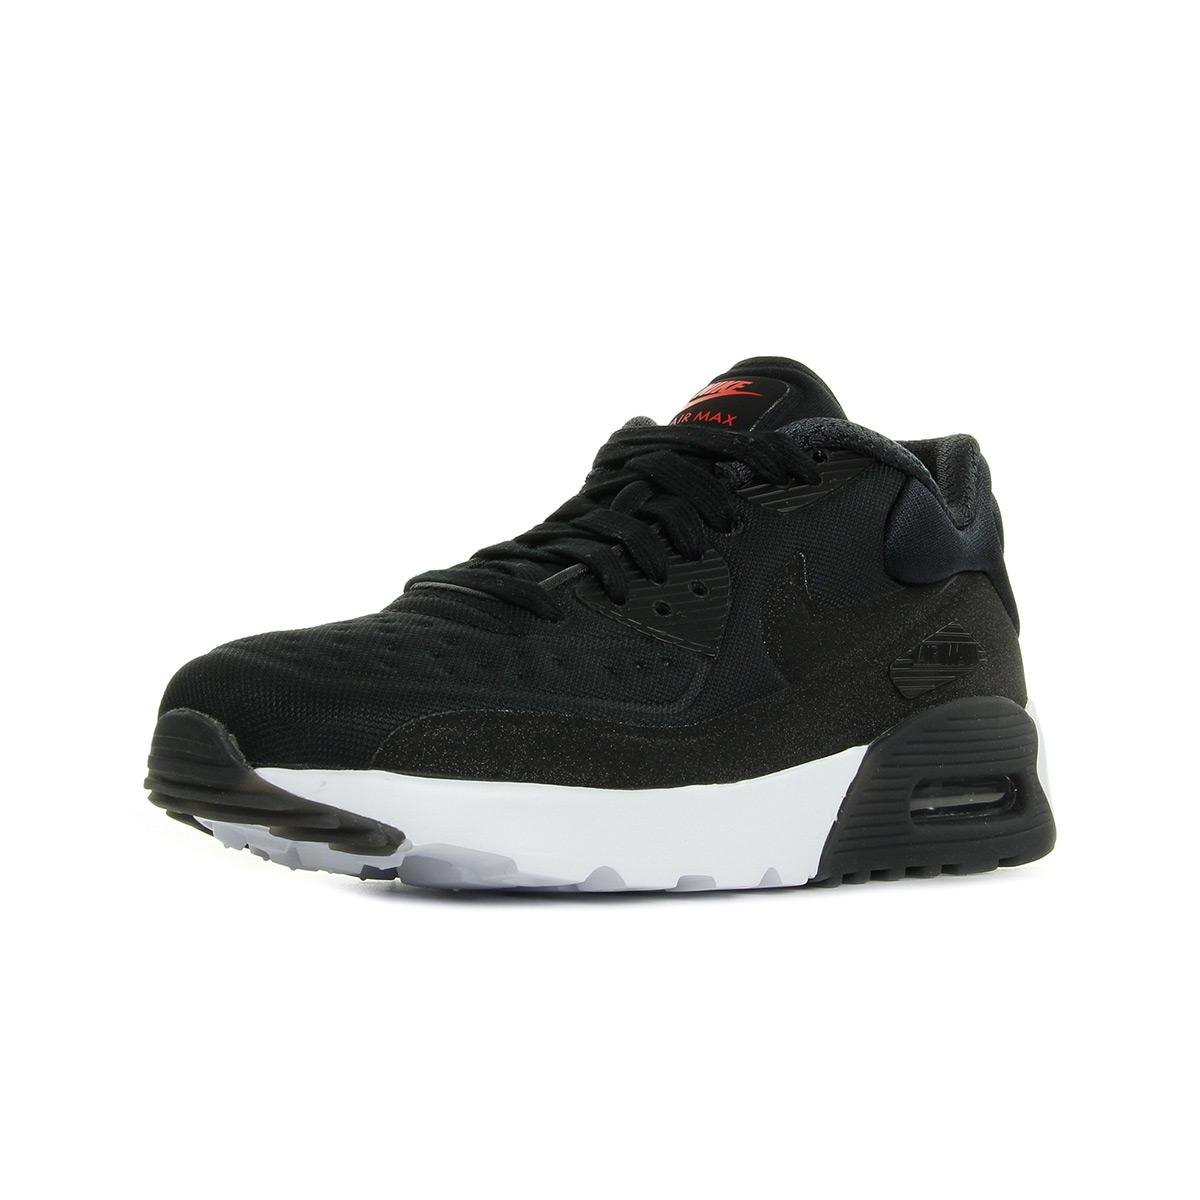 Chaussures Nike Chine Usine Chaussures Grossiste Grossiste Chine Grossiste Nike Chine Chaussures Usine vNmnOy80w